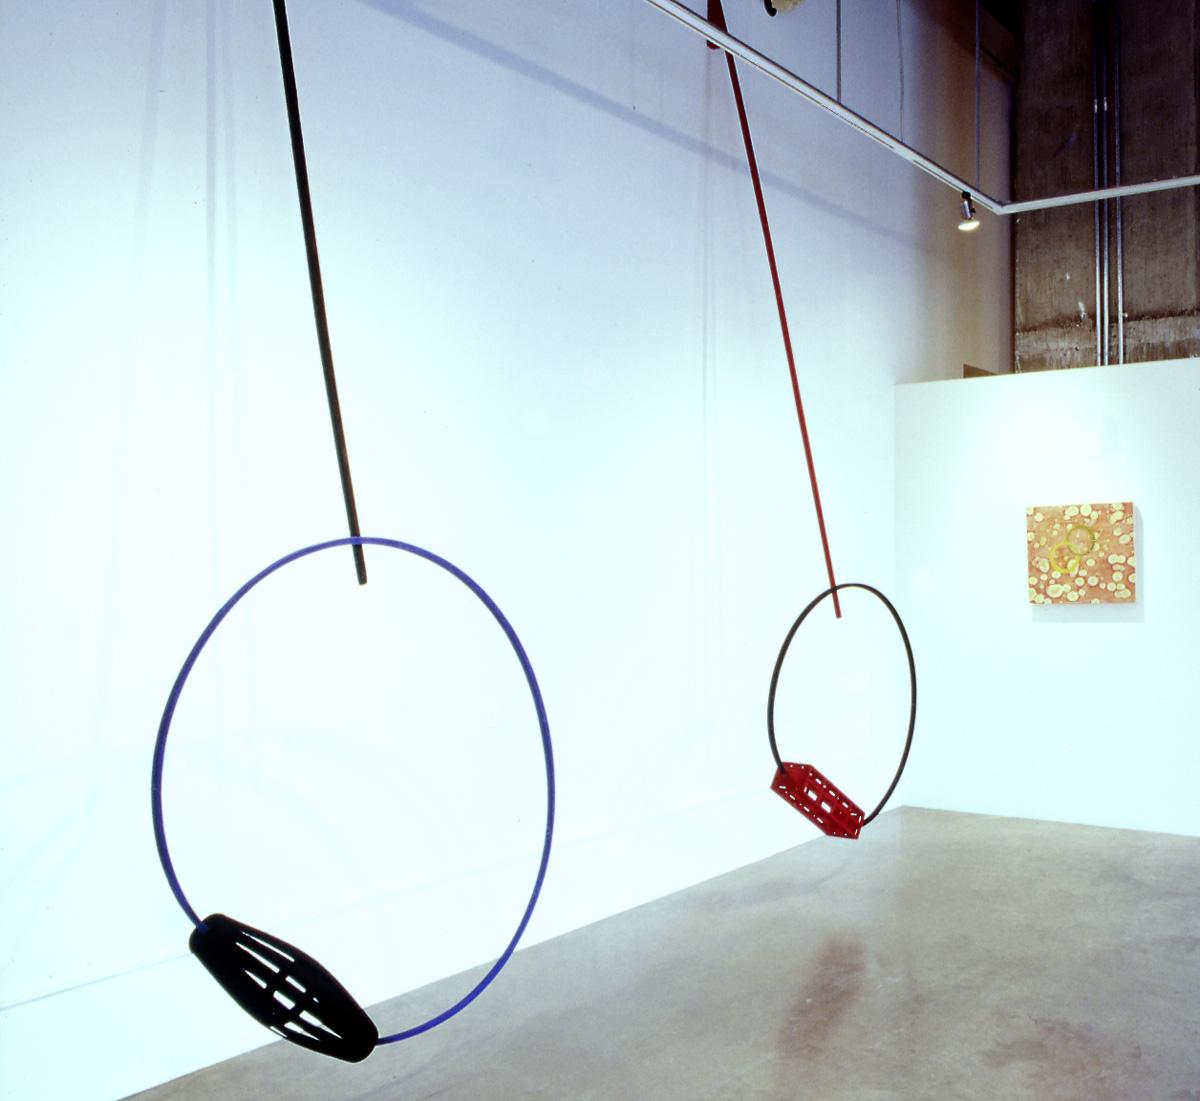 """Portals I & II, wood sculpture, 12' h x 4' w x 3' d each; flocked oak and pine; installation view, @ Tom Gormally"